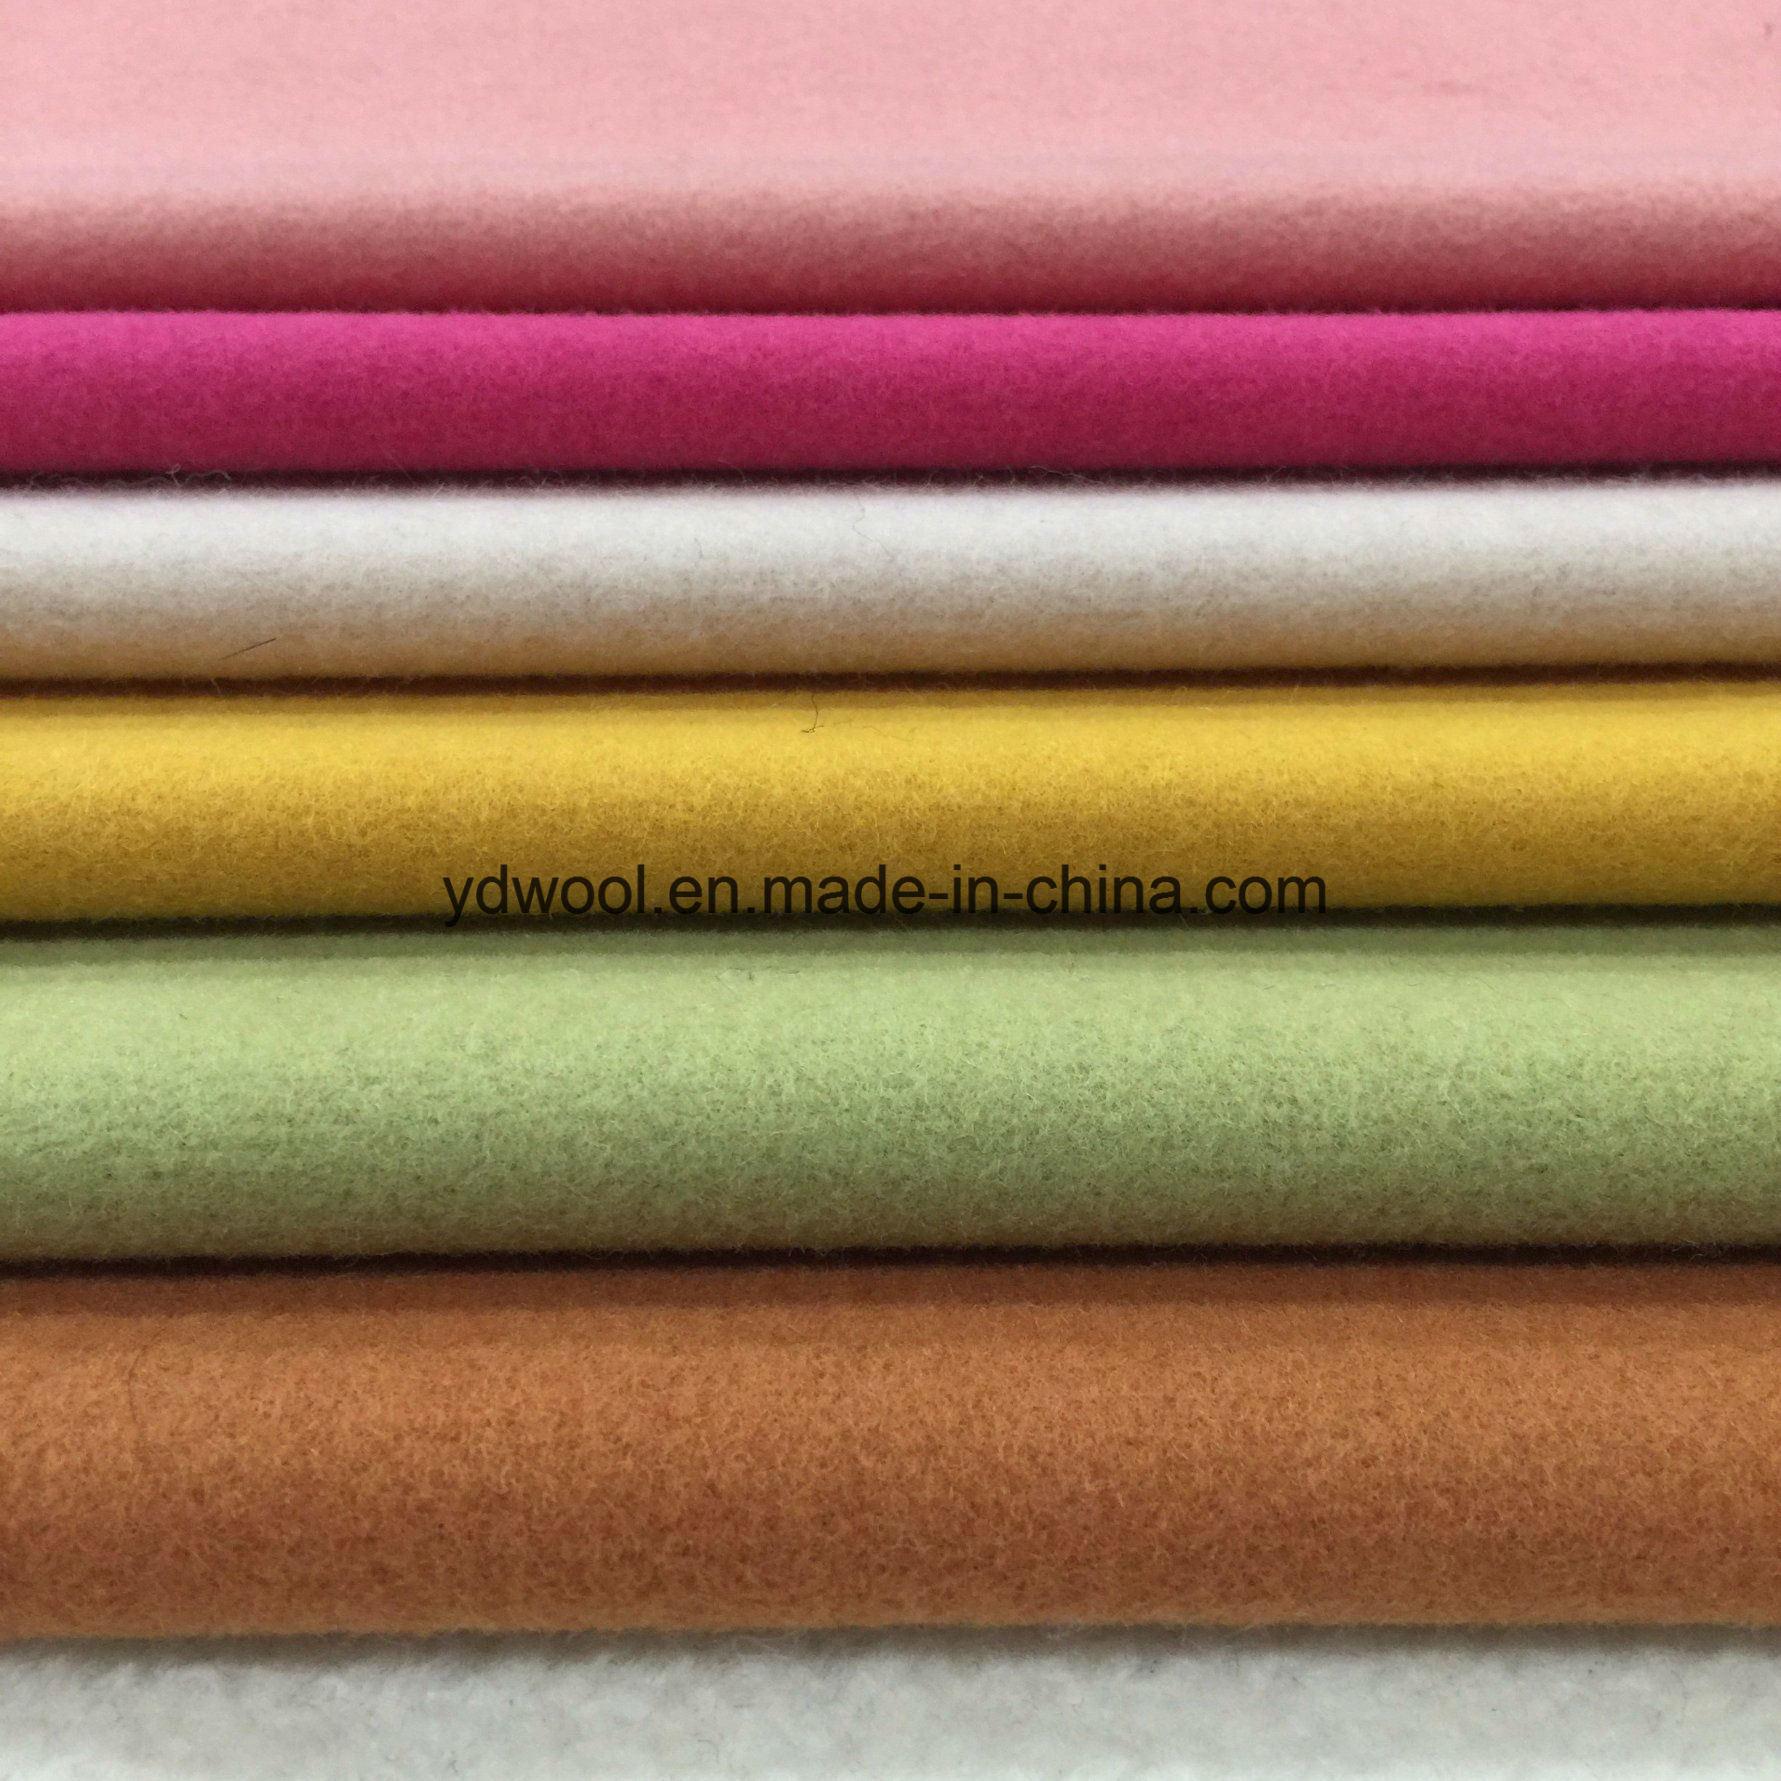 Decatizing Roman Knitting Wool Fabric Ready Greige